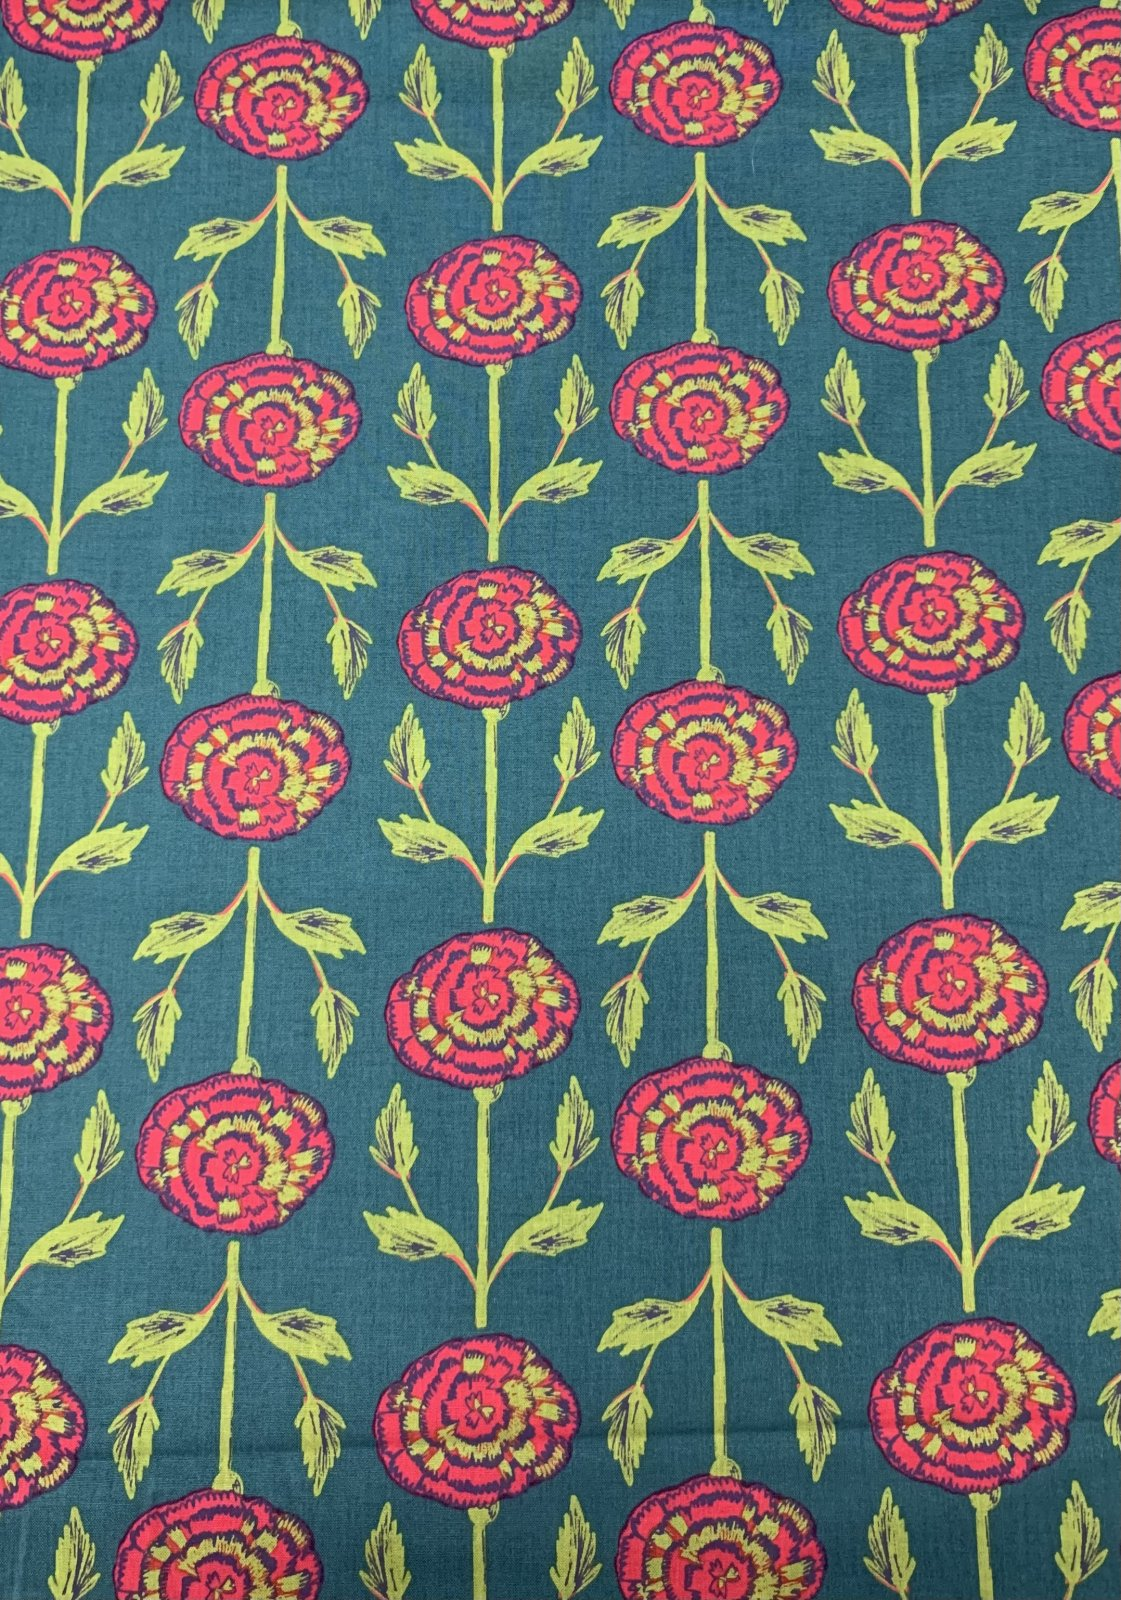 Carnations (O)